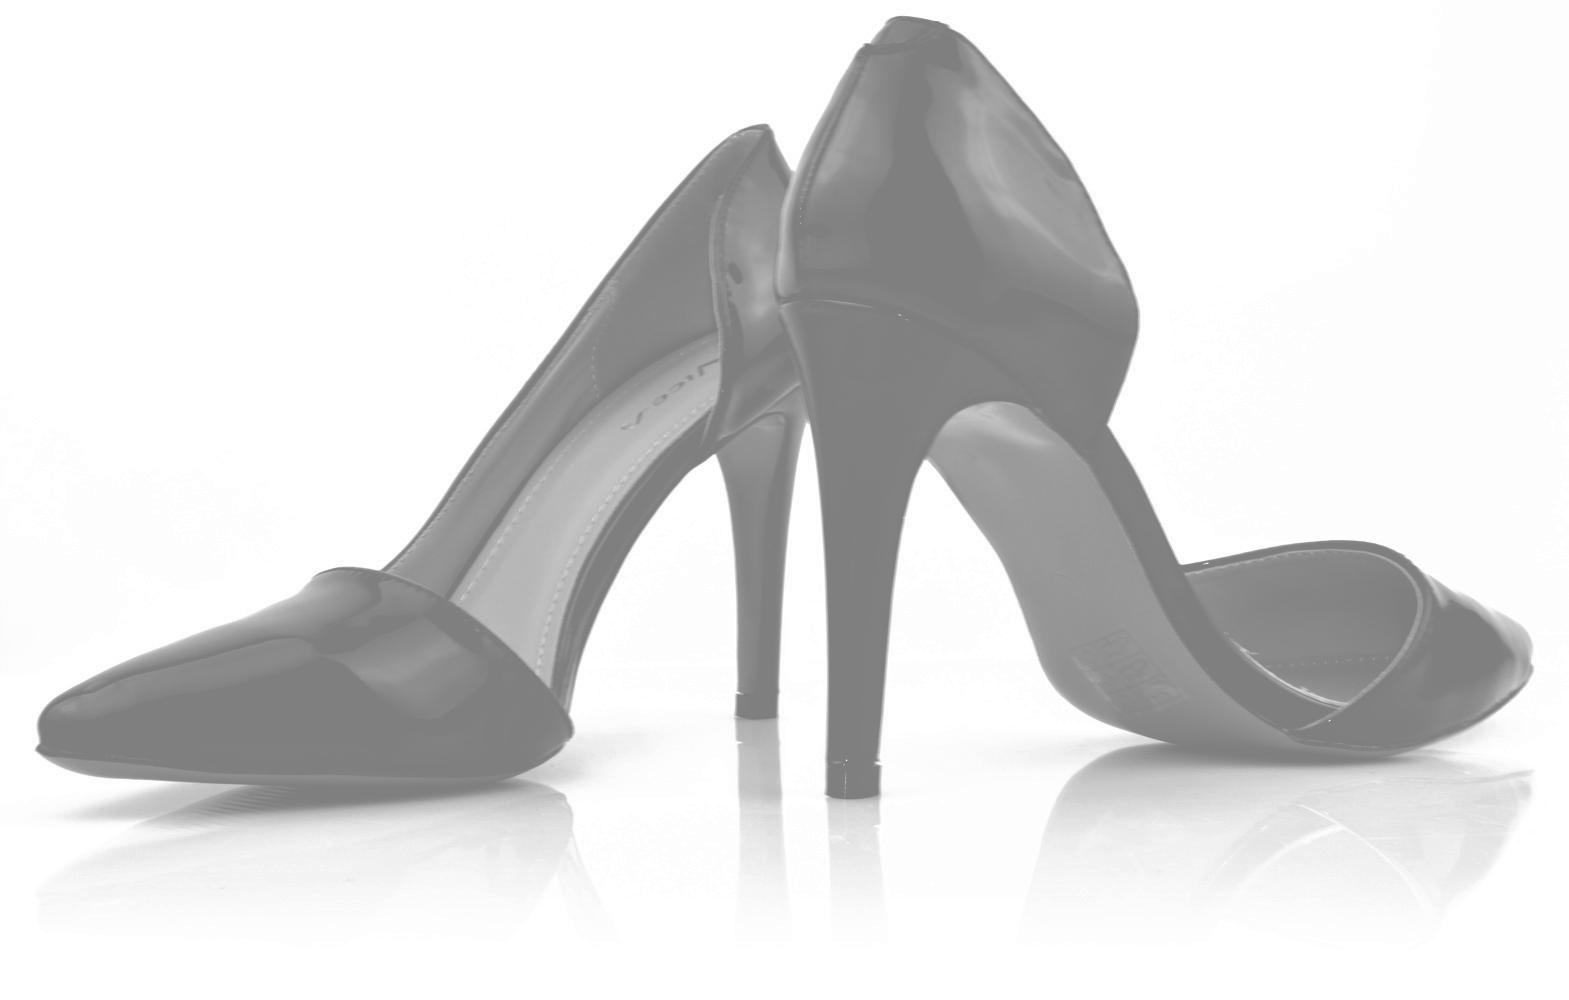 Sandalen High Heels Stiletto Wildleder Optik Nieten Abendschuhe Damenschuhe